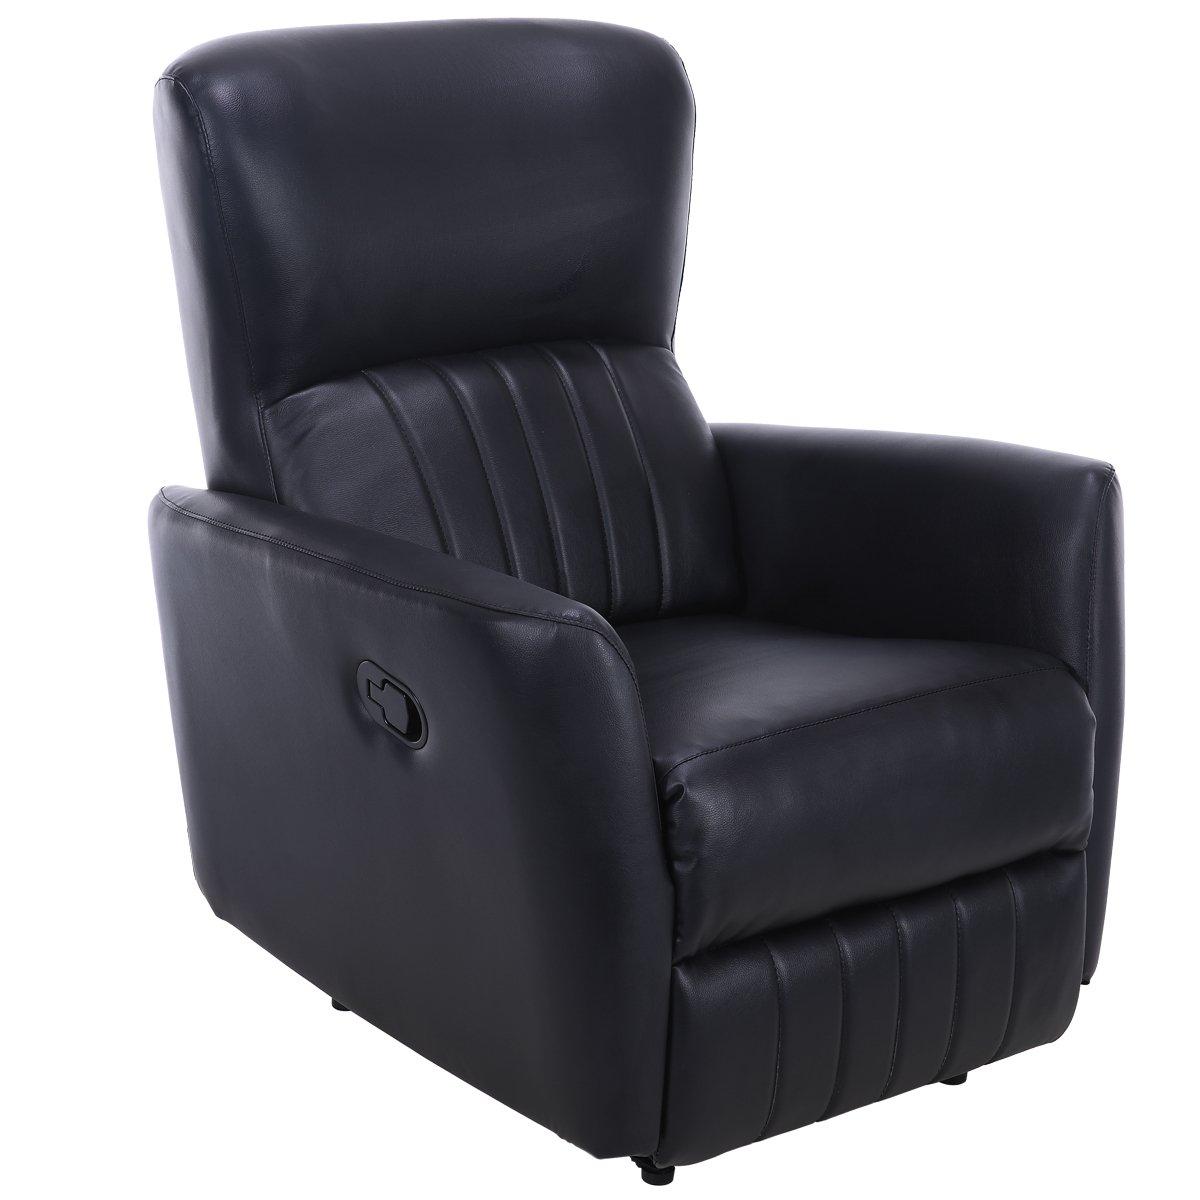 Giantex Recliner Chair PU Leather Lounger Club Manual Home Theater Seating Ergonomic Reclining Sofa Chair (Black)